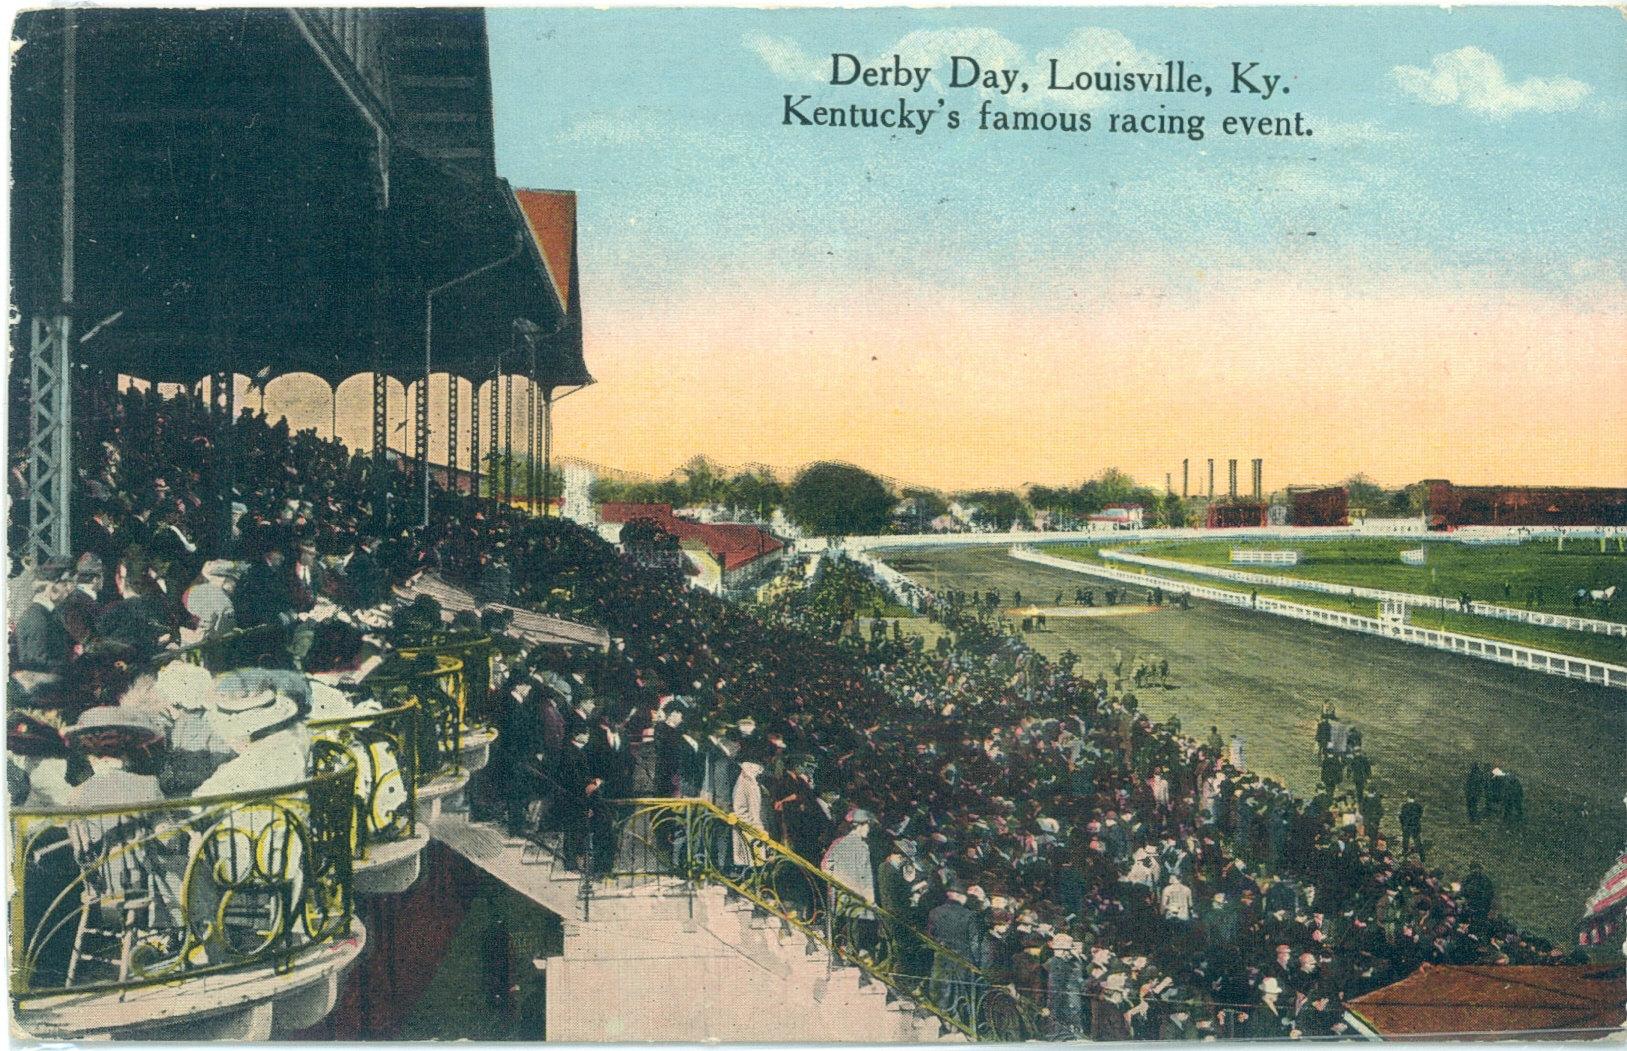 Vintage Kentucky Derby 105